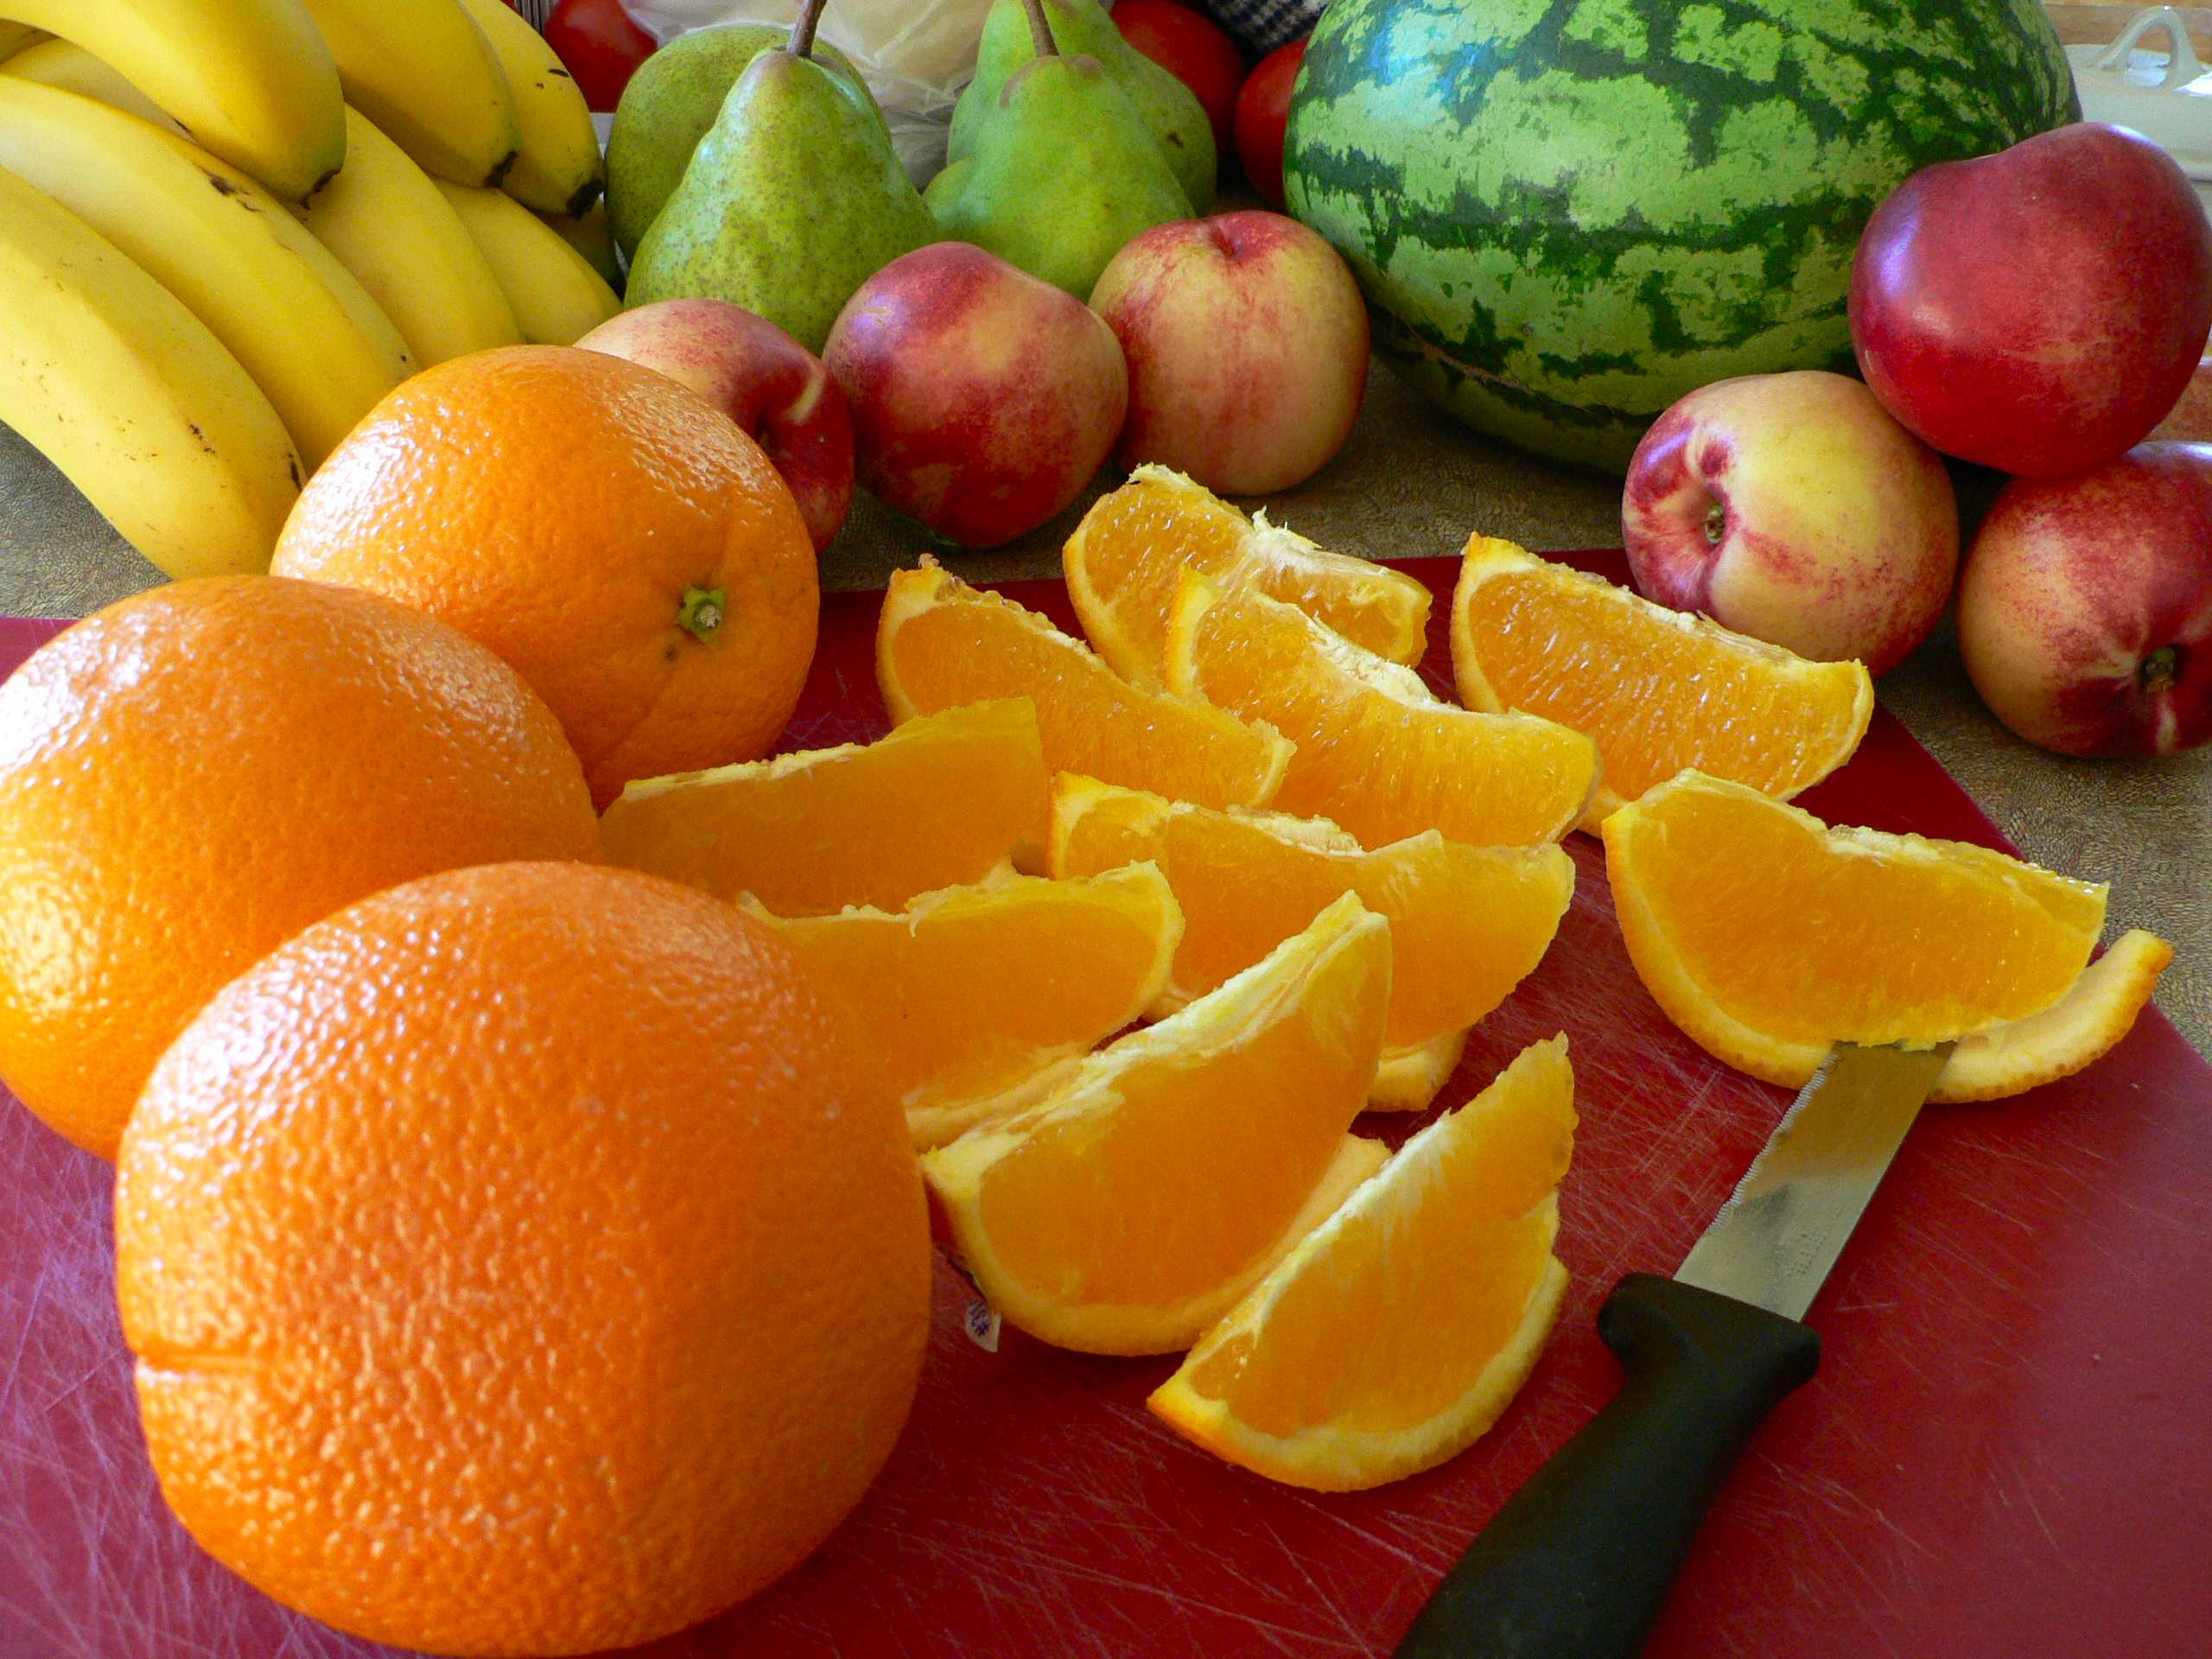 ranges,bananas,pears,apples,andawatermelon